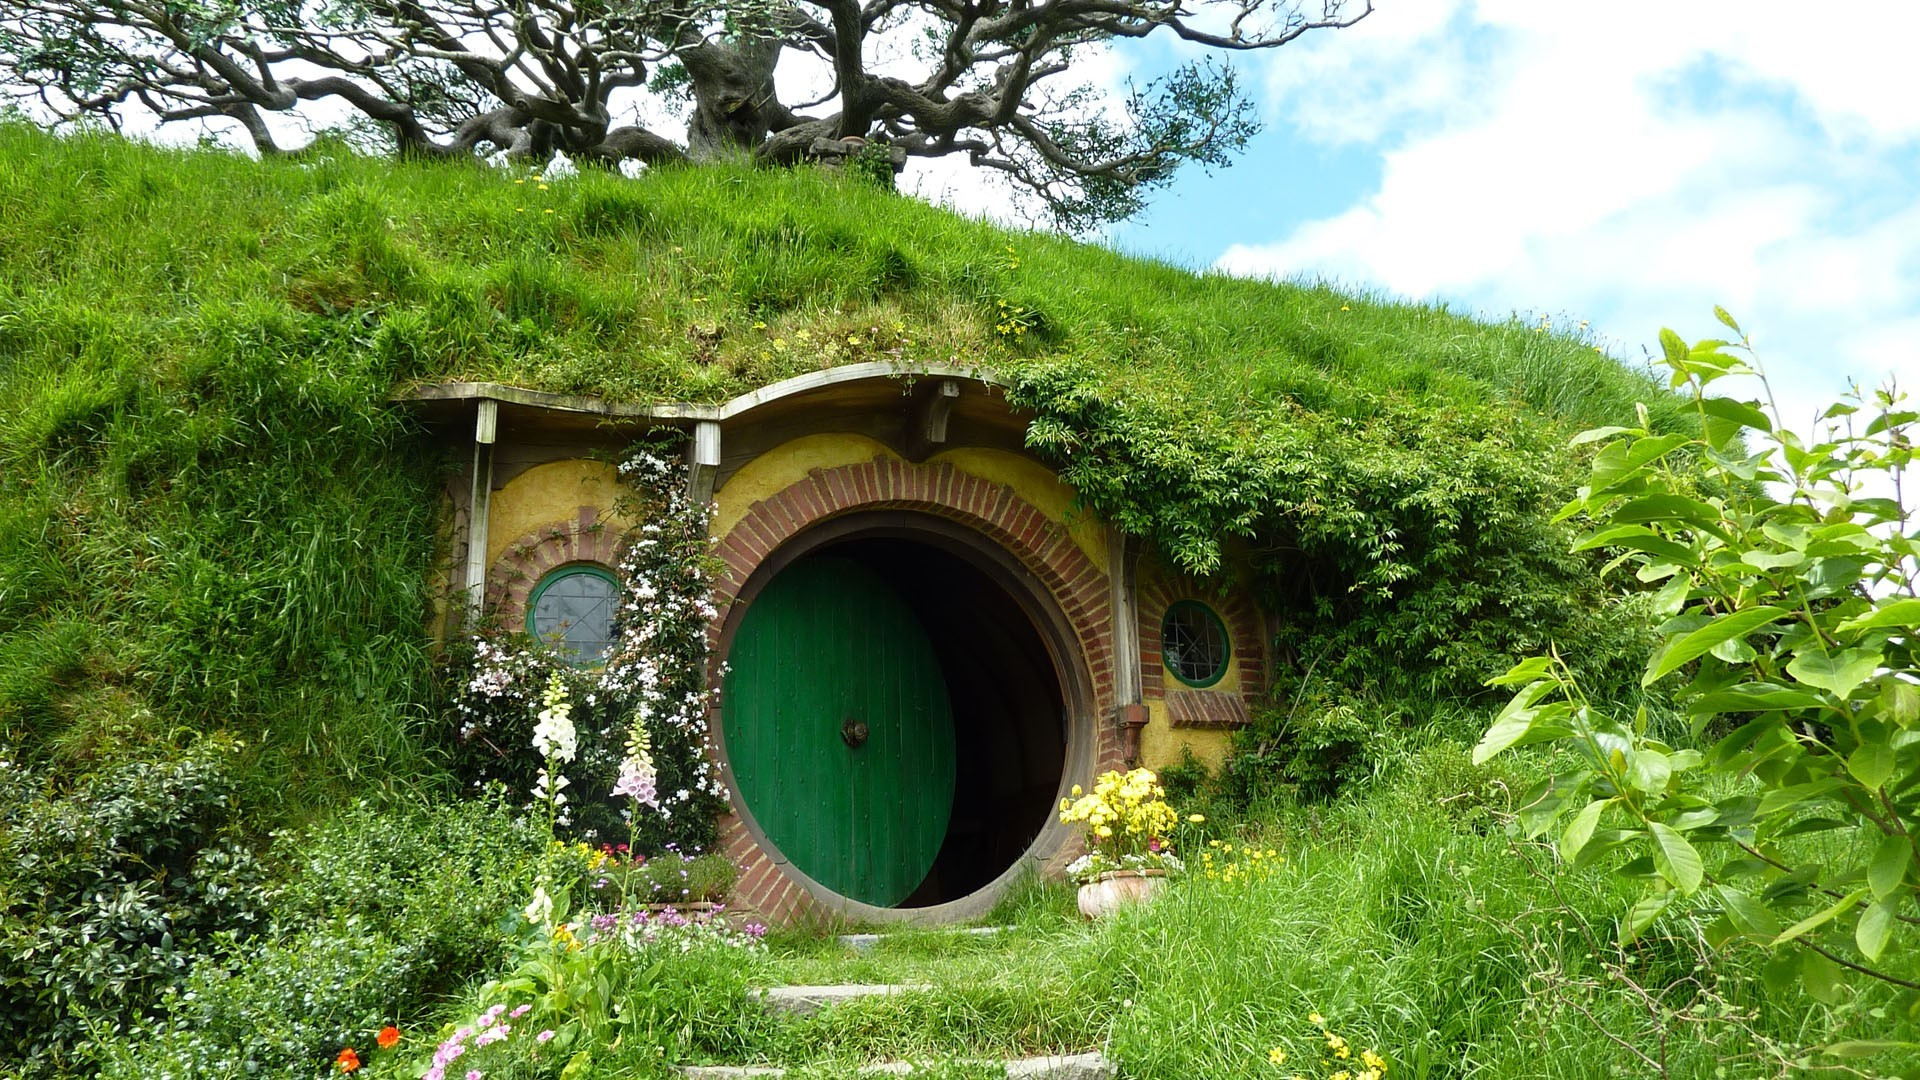 nature, Landscape, House, New Zealand, Hobbiton, Door, Trees, Grass